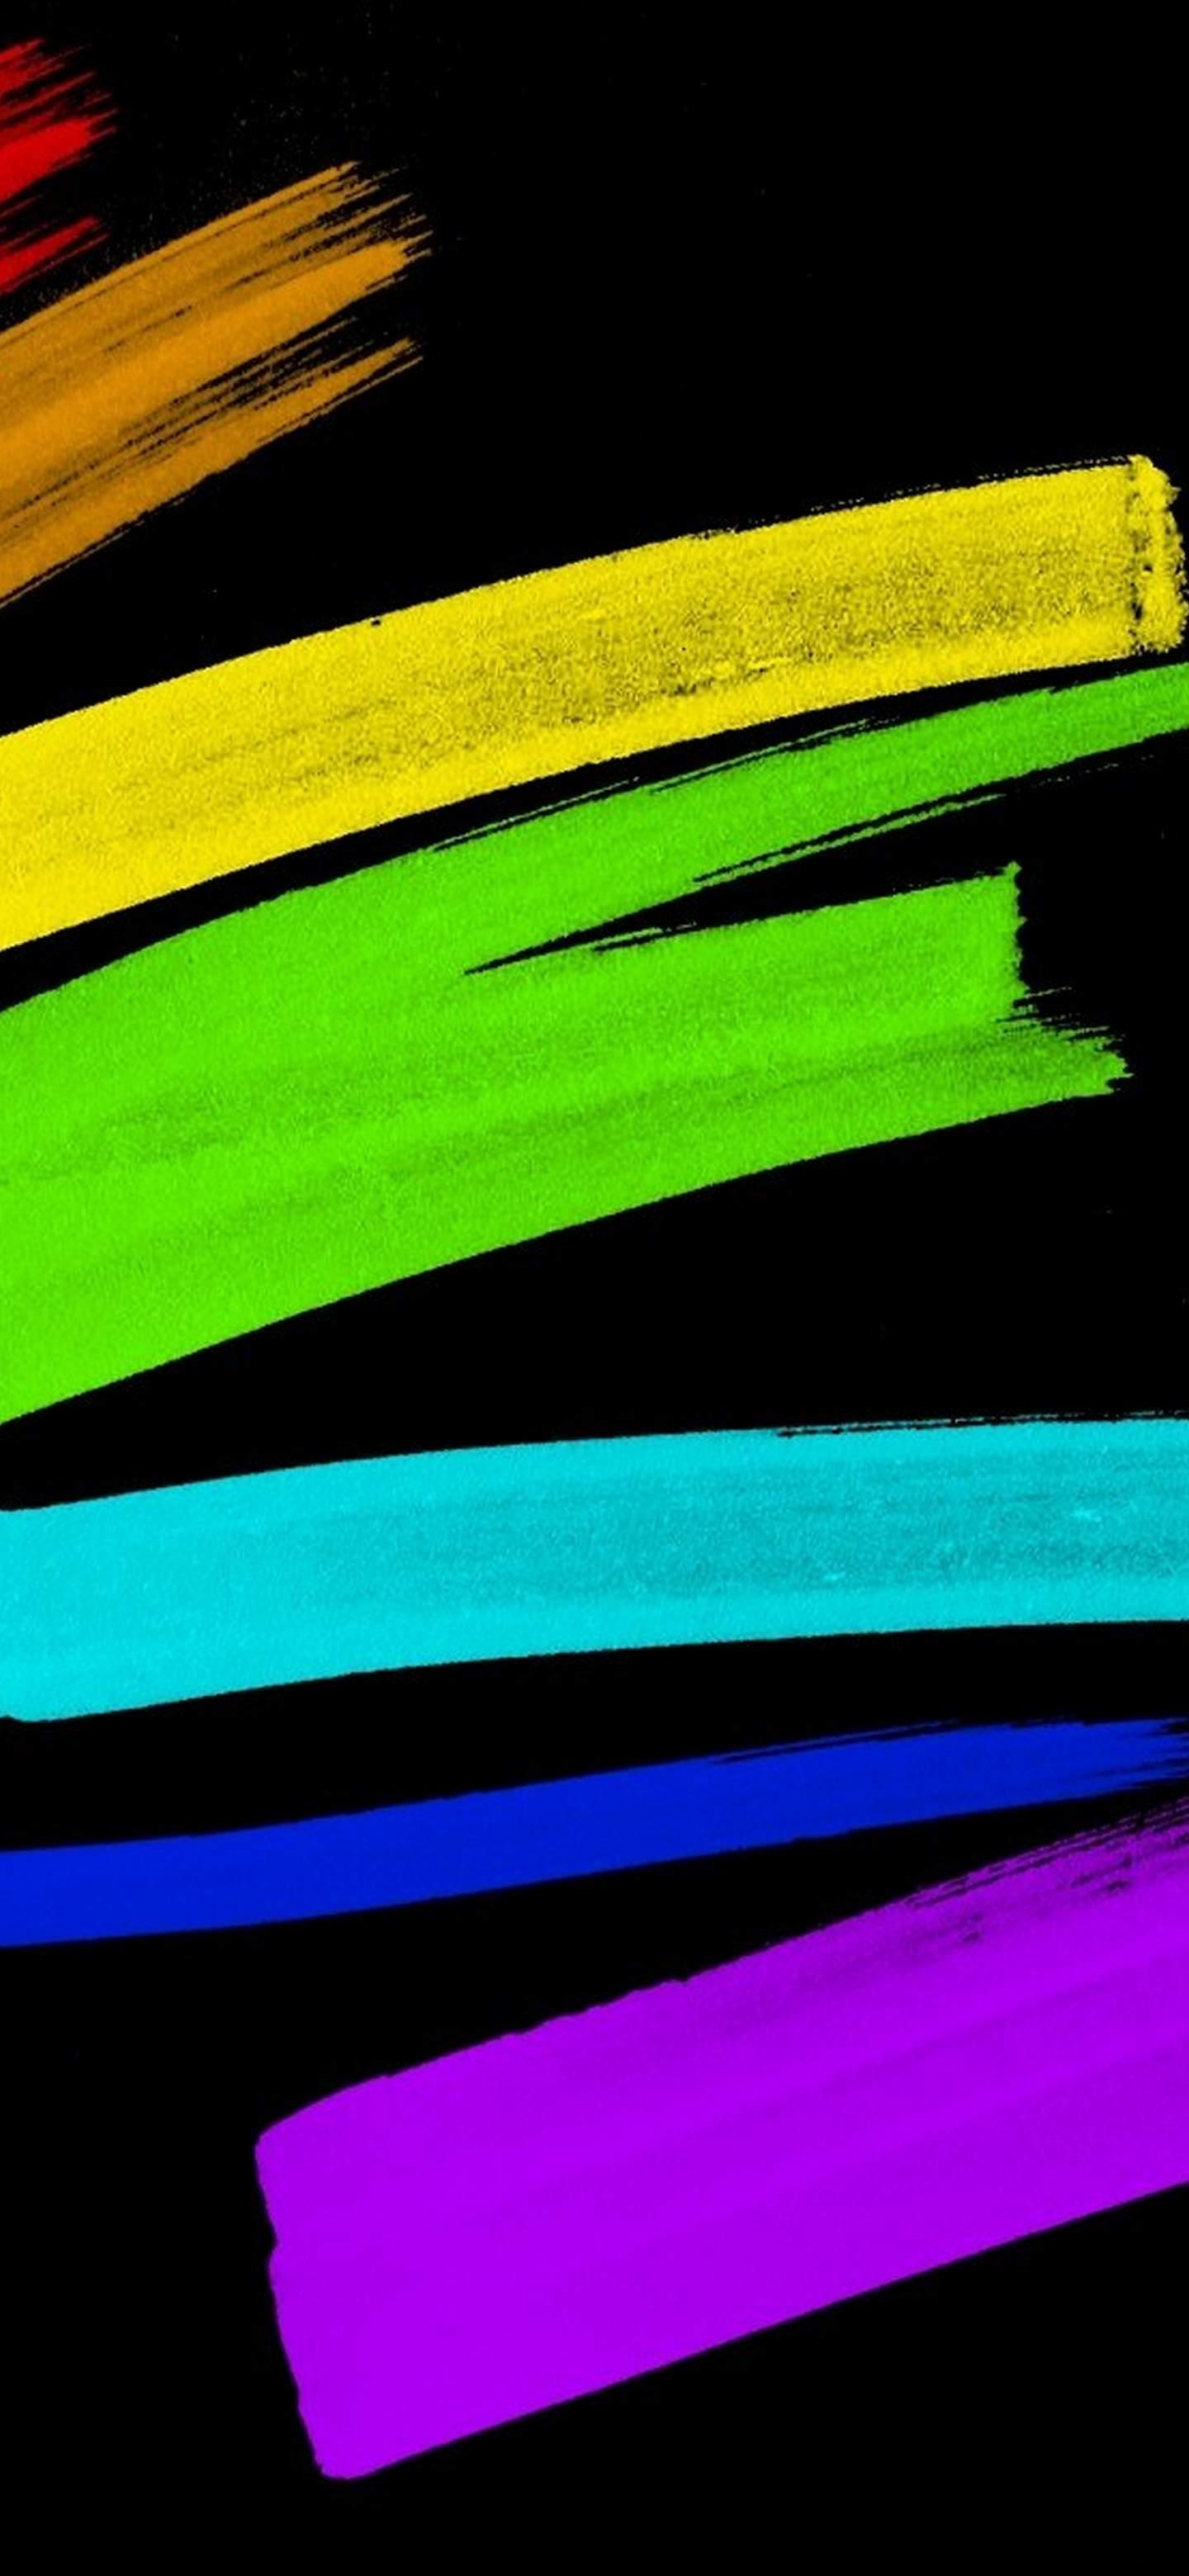 3d Bike Wallpaper Image Download 1440x3120 Wallpaper 135